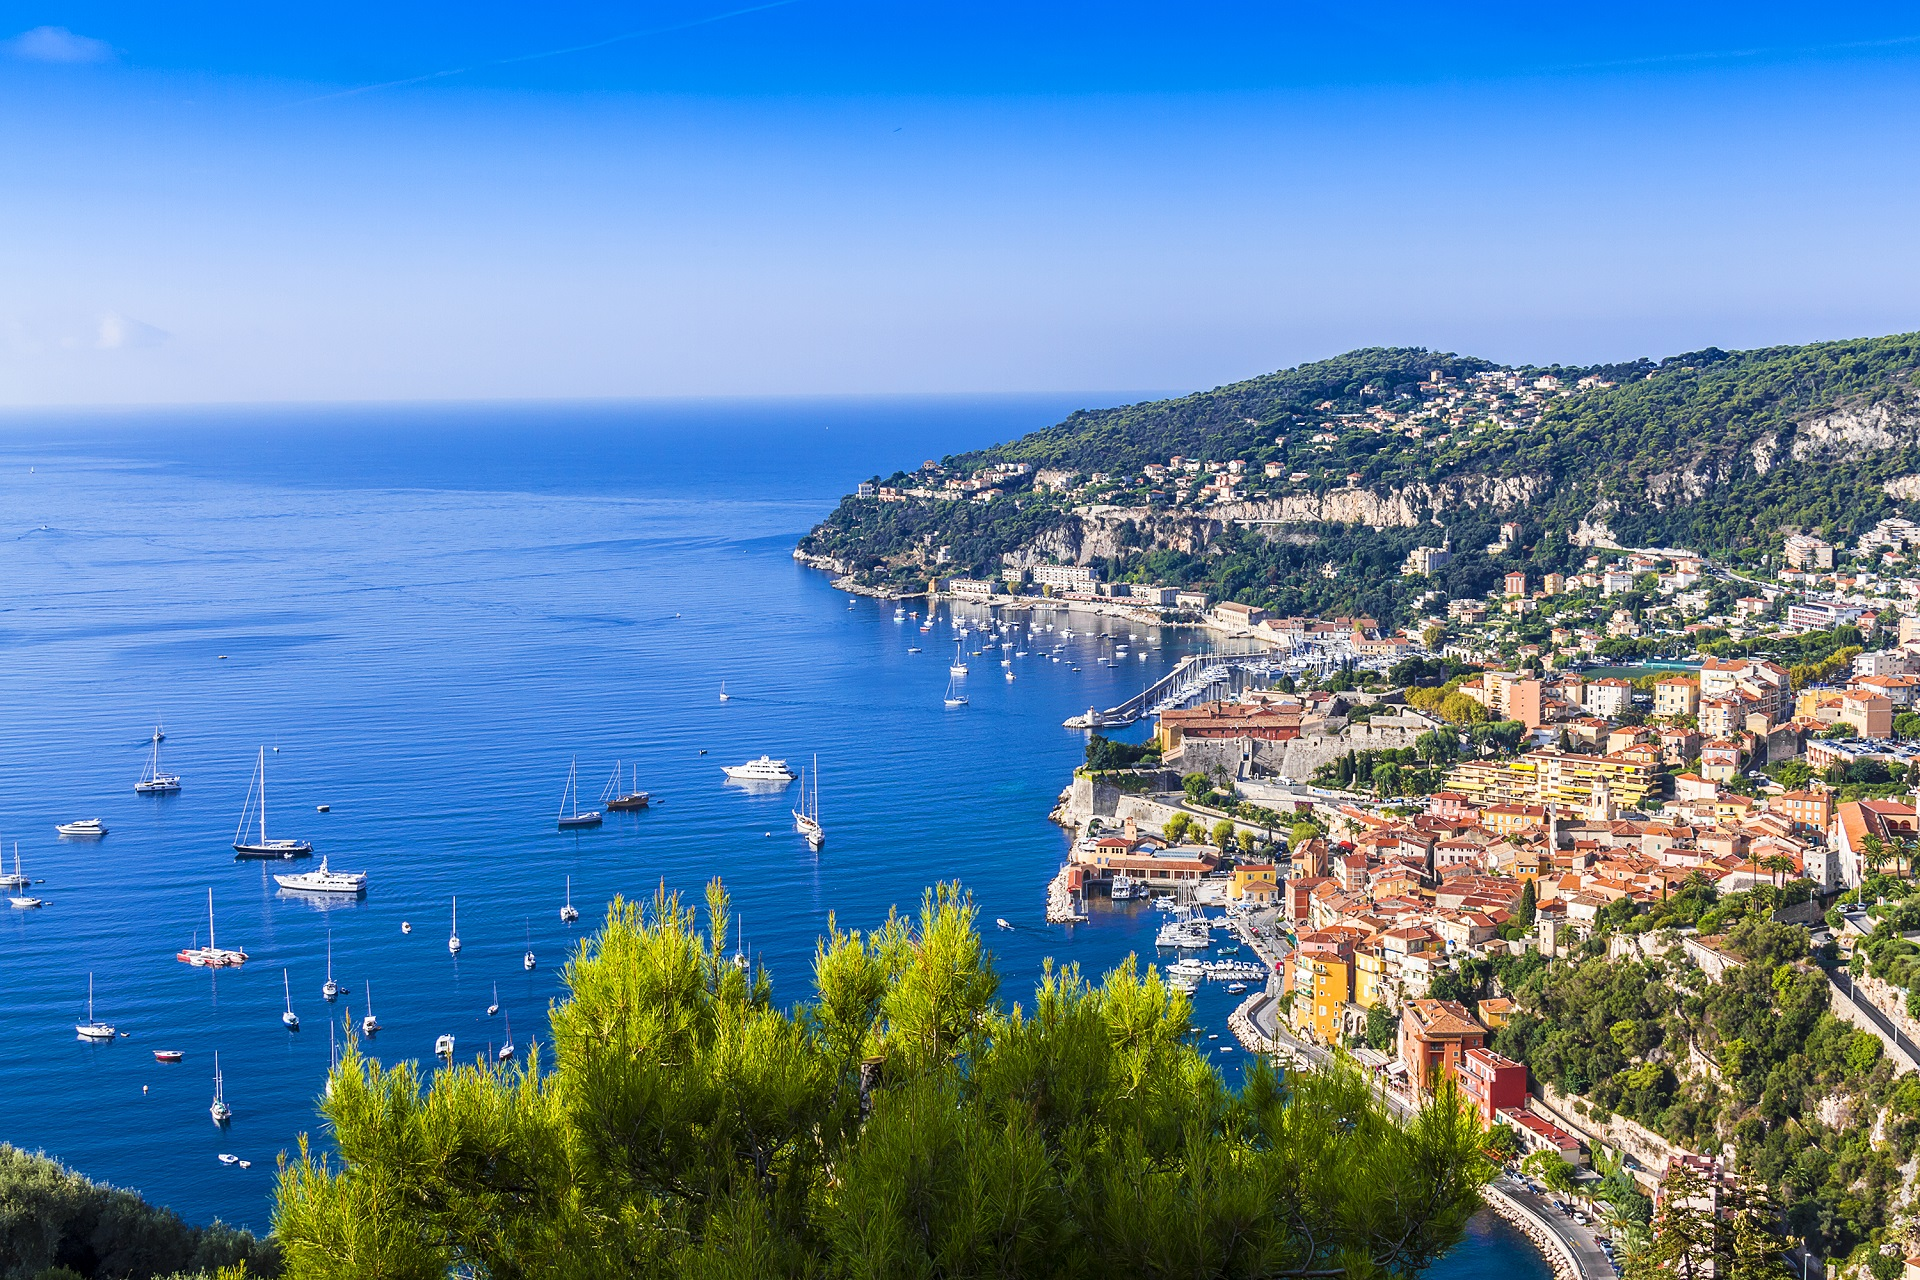 Nizza_Nice best view_Cote d'Azur shutterstock_175577219